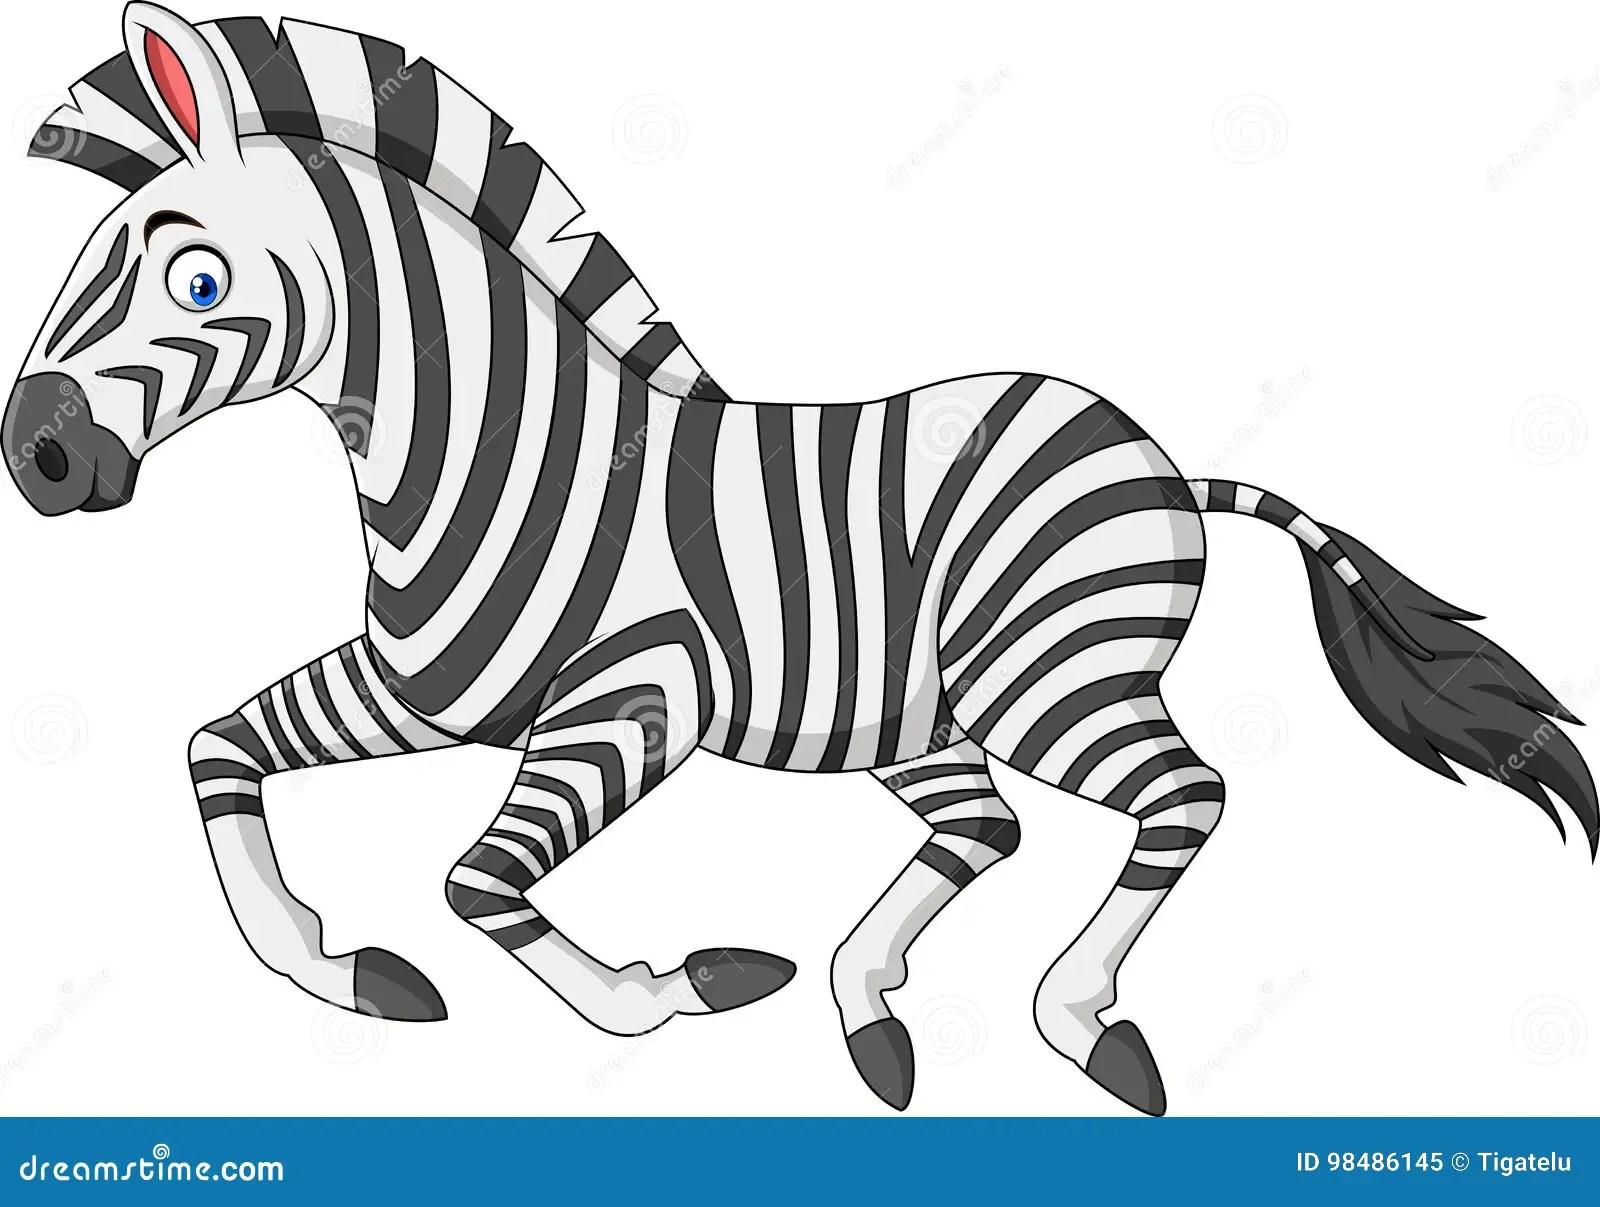 Cartoon Zebra Running Stock Vector Illustration Of Smile